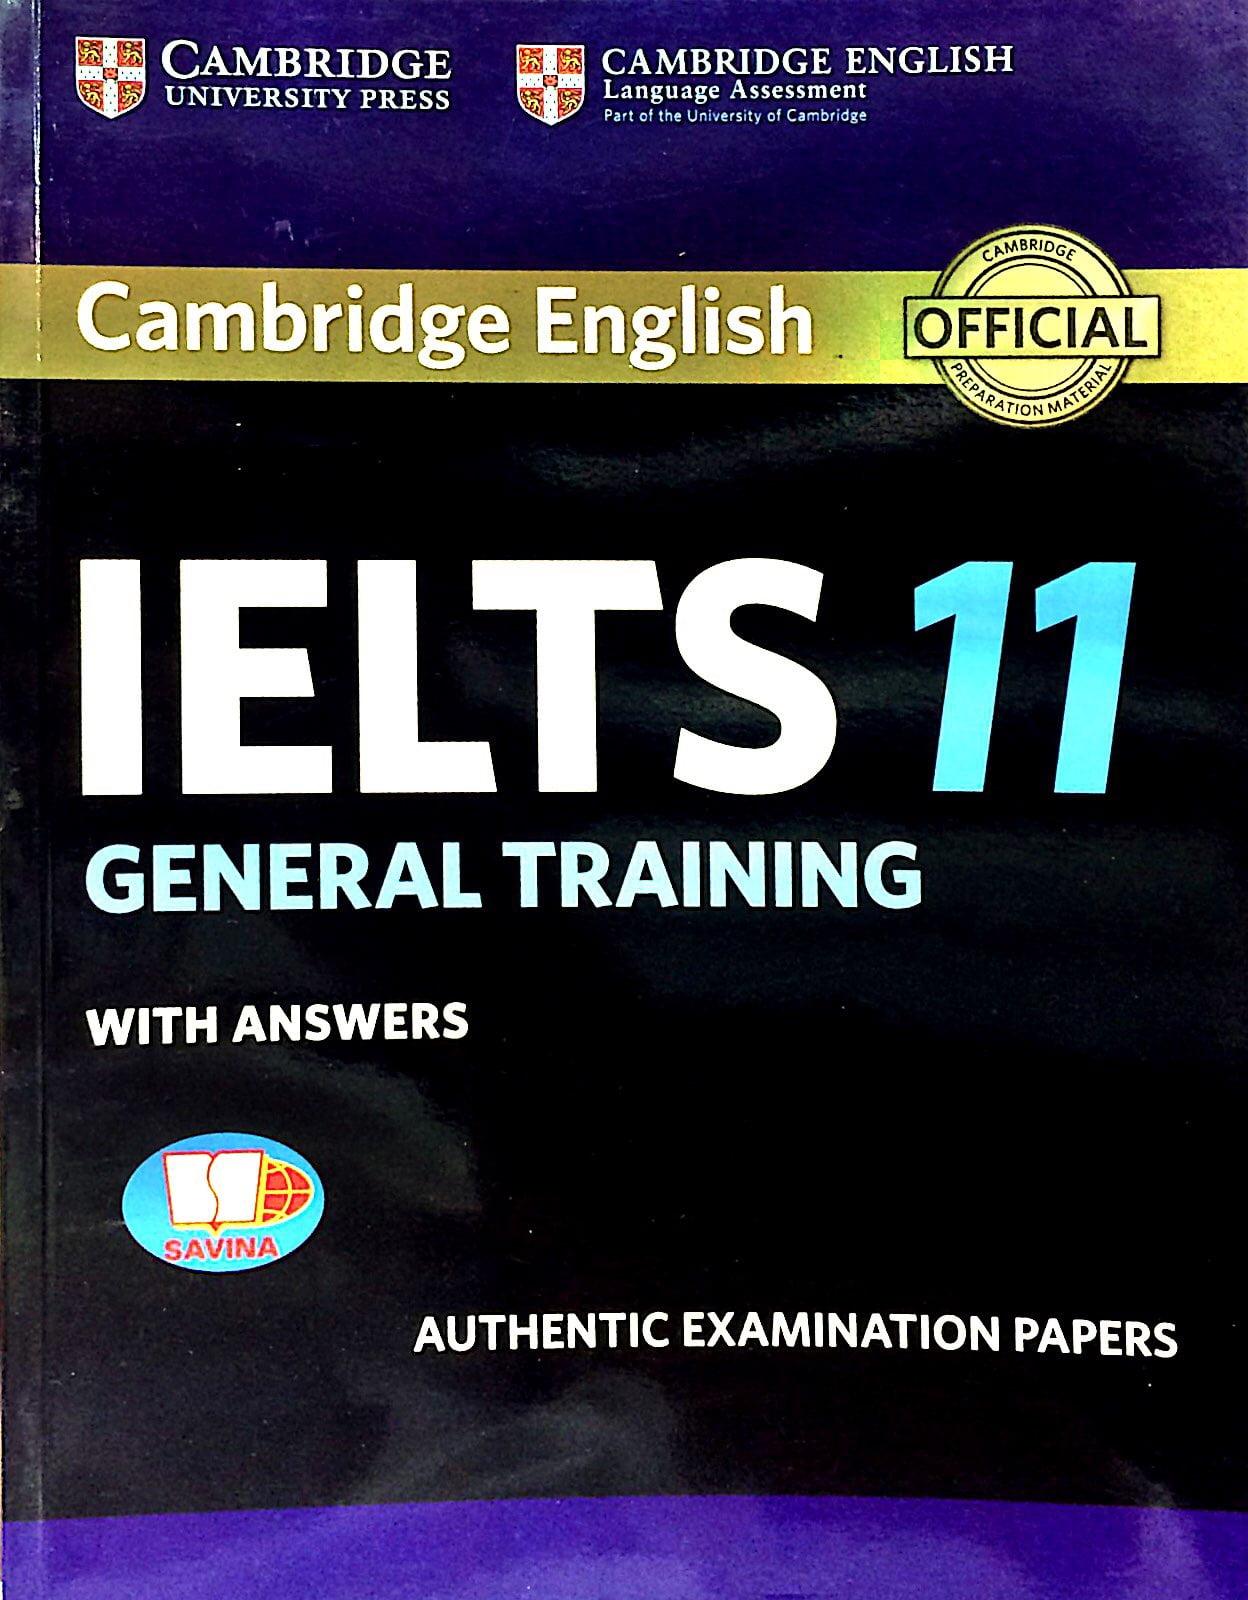 Fahasa - Cambridge IELTS 11 General Training With Answers (Savina)